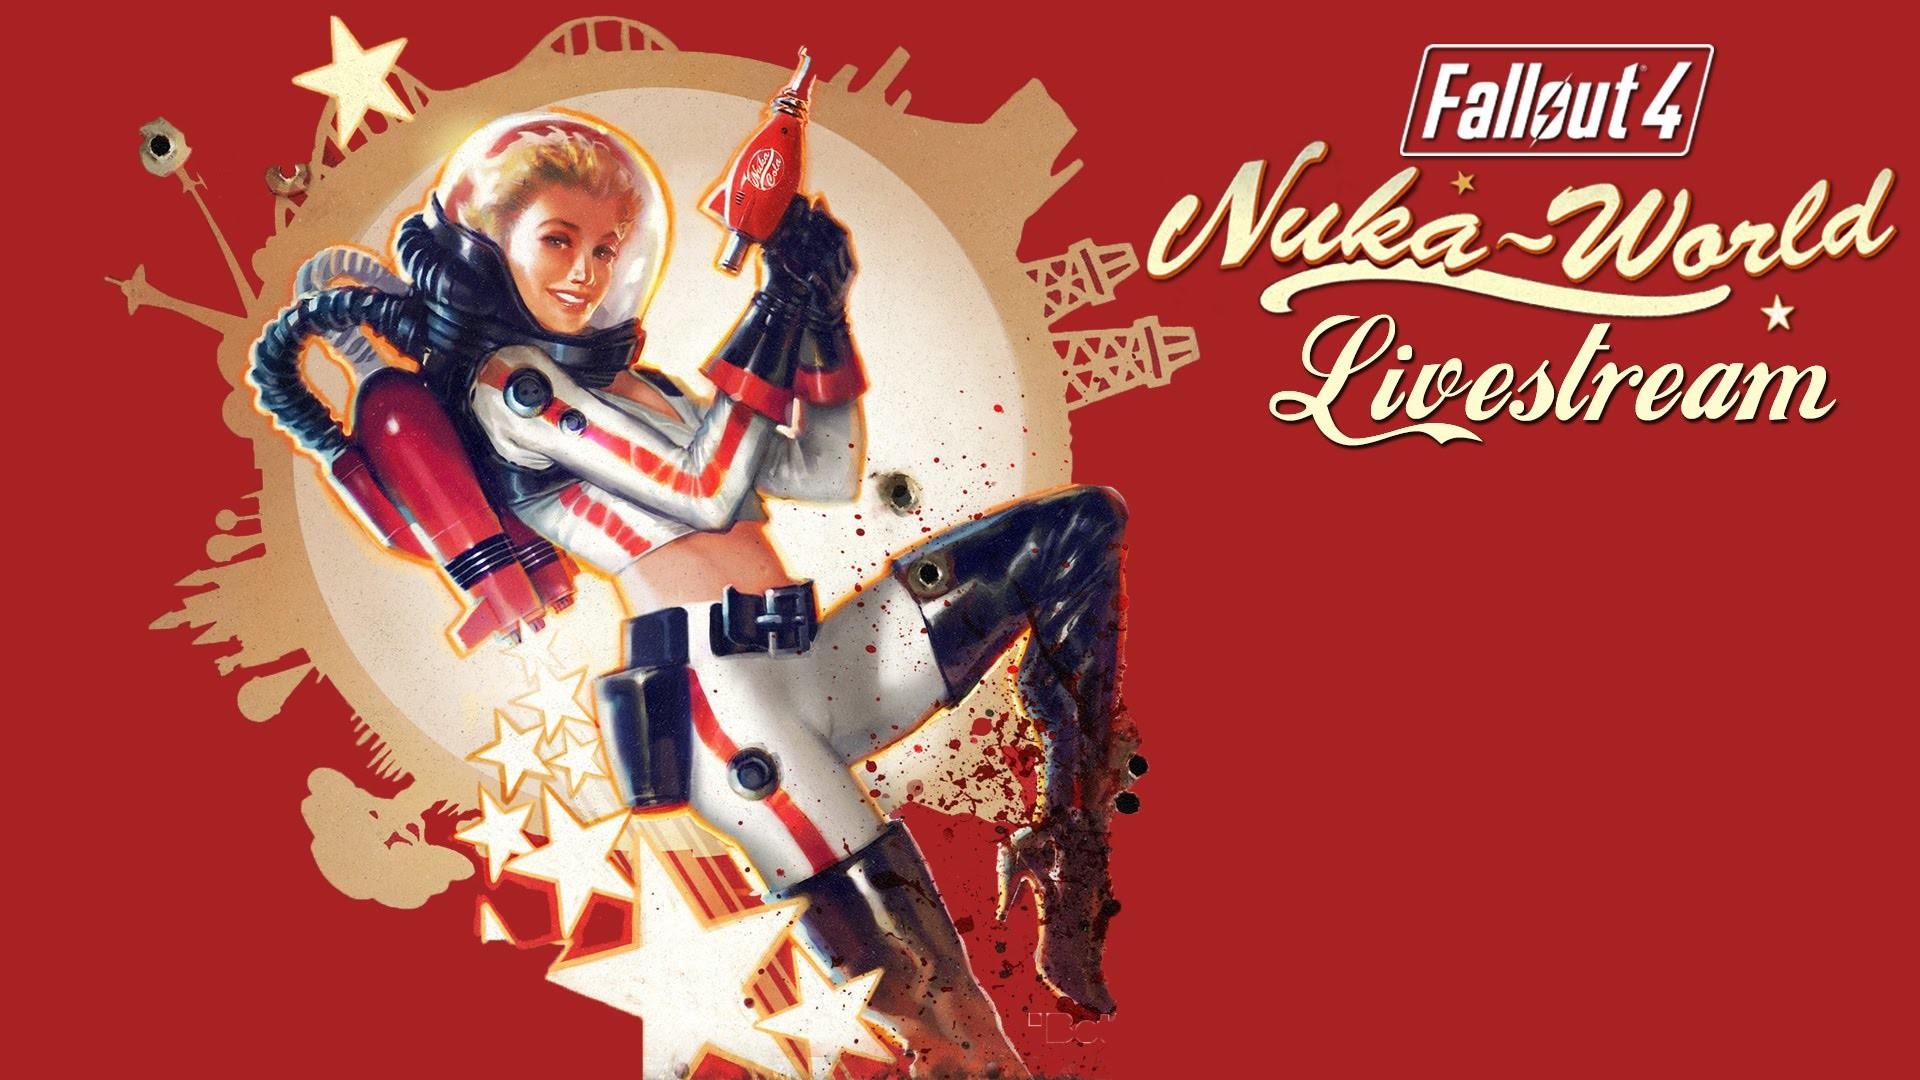 Res: 1920x1080, Fallout 4 Nuka-World Livestream